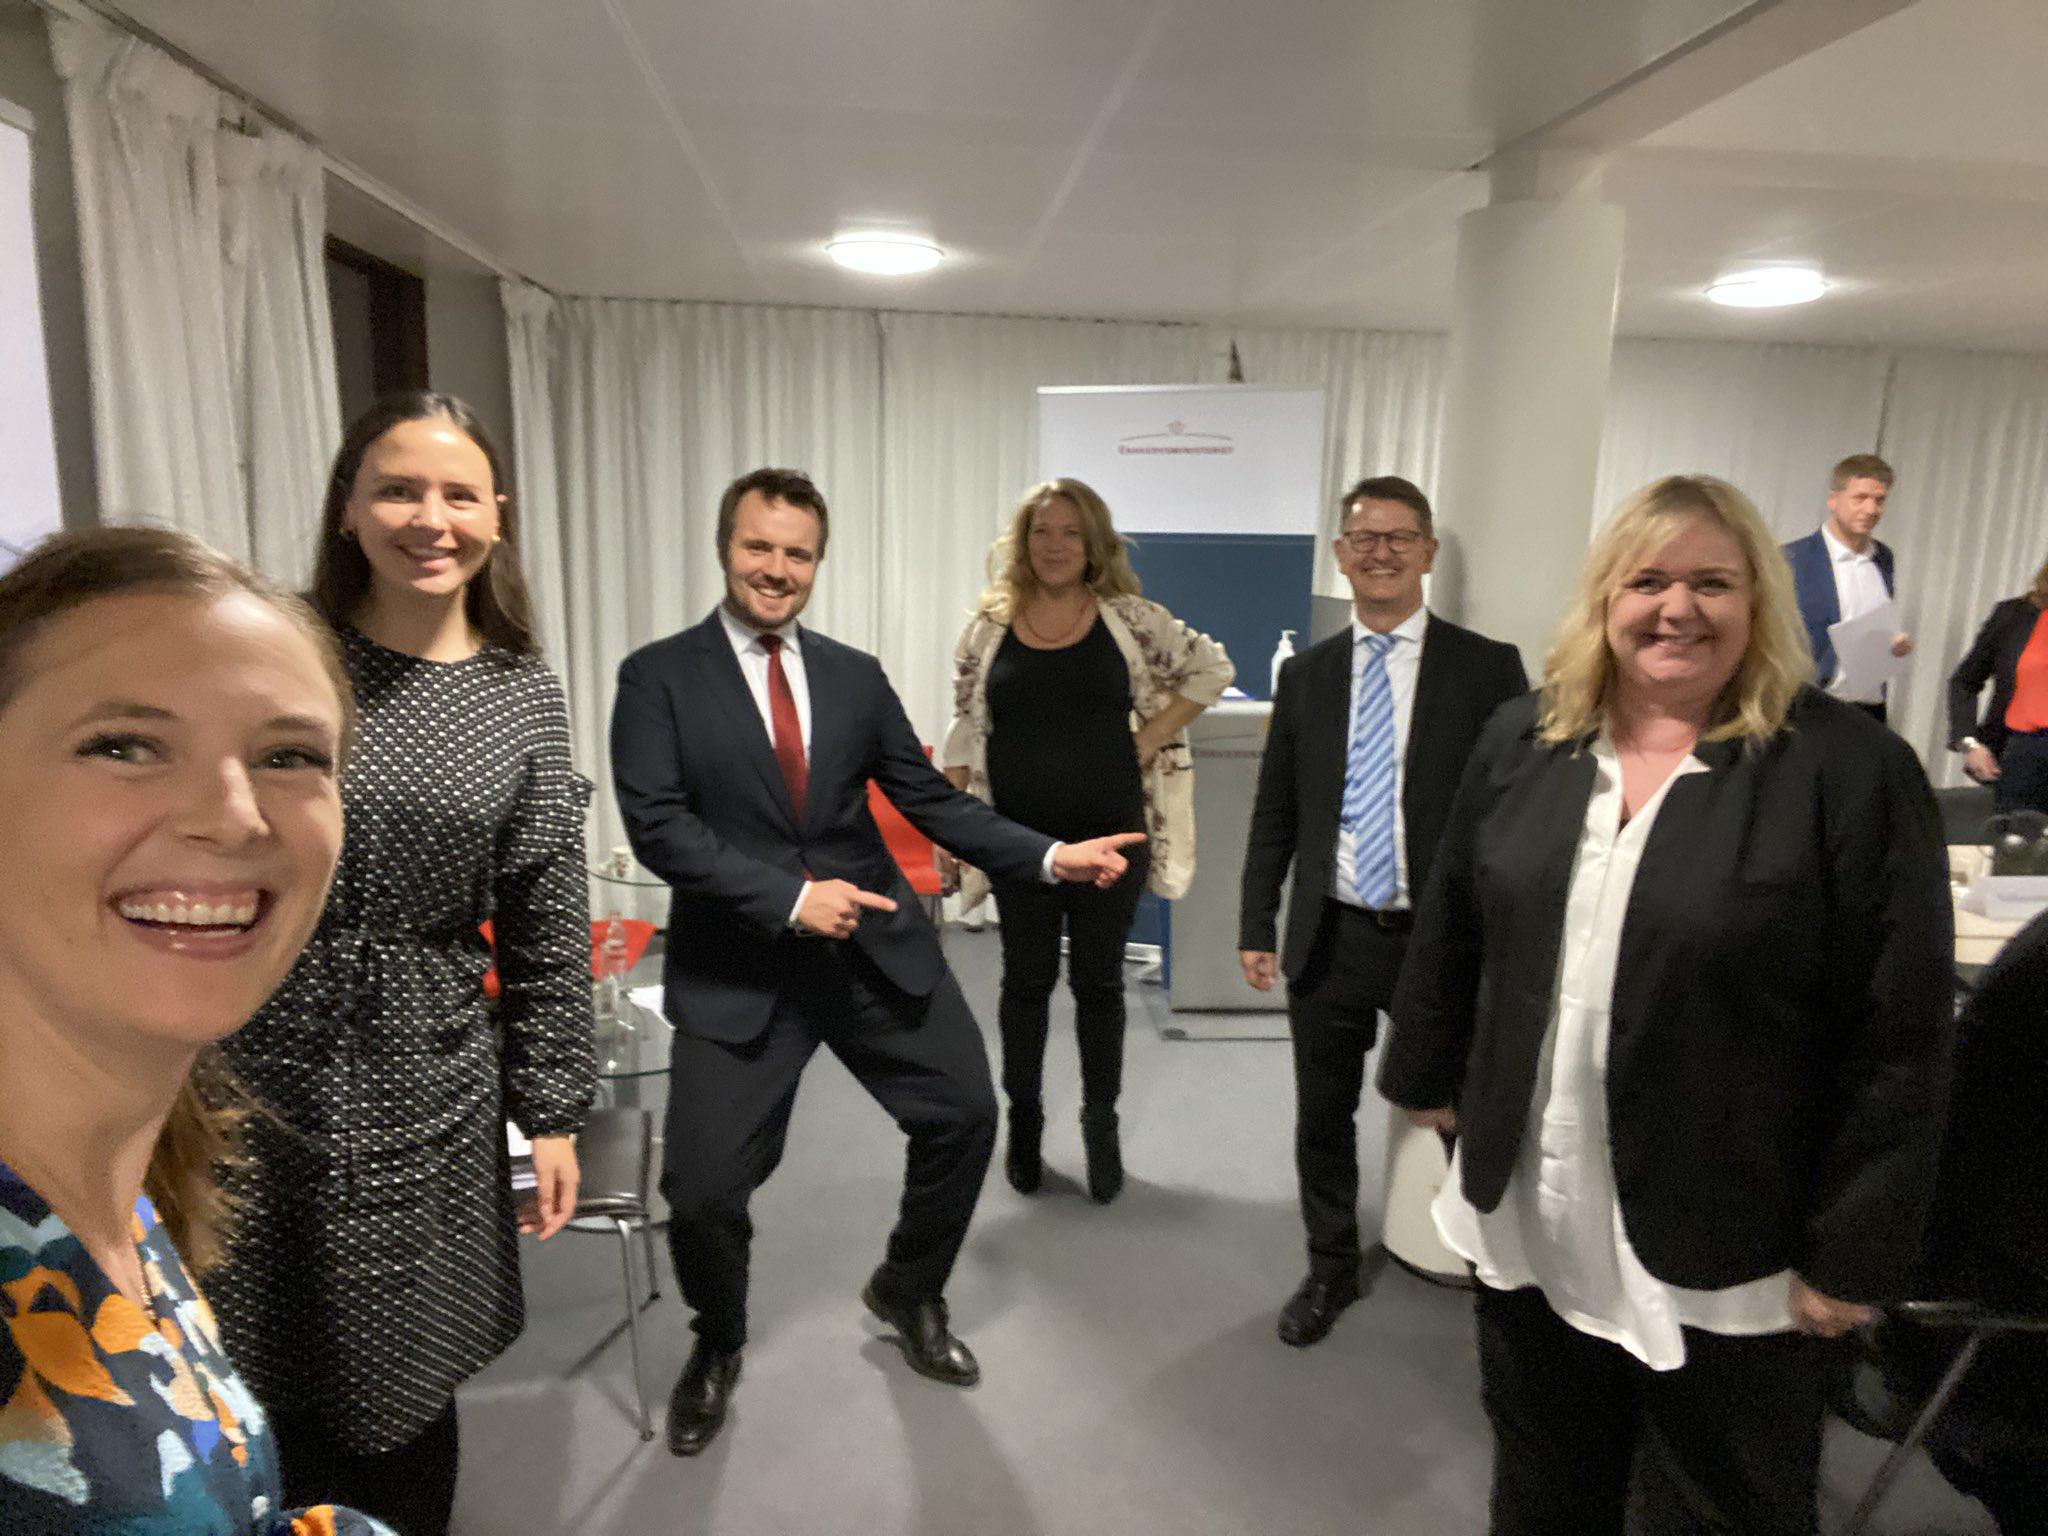 Twitterfotoet fra De Radikales erhvervsordfører, Katrine Robsøe, til venstre, med en nærmest dansende erhvervsminister, Simon Kollerup.